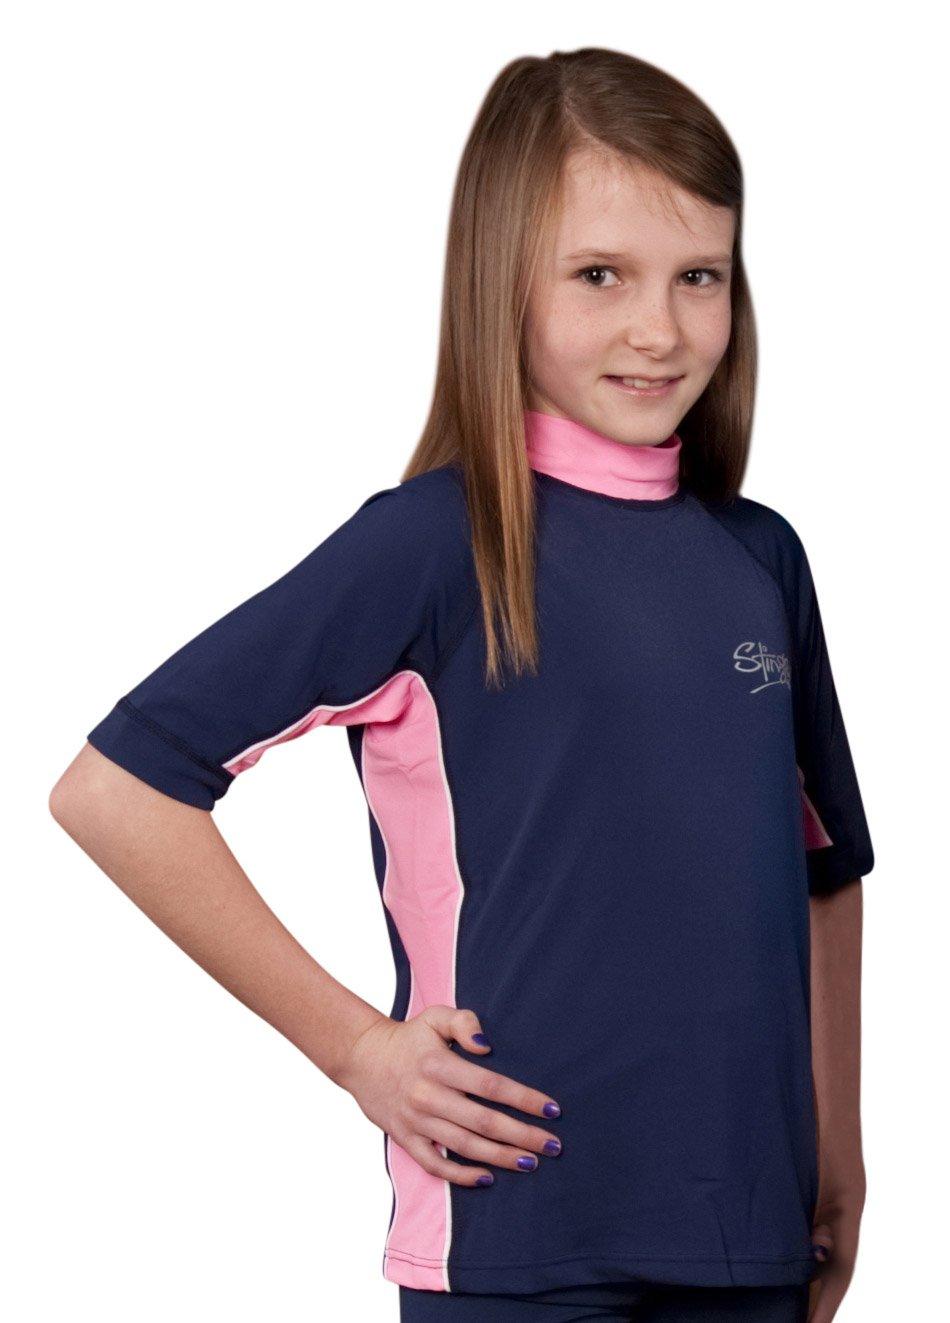 Girls Rash Guard UV Sun Protective Swim Shirt - Short Sleeves - Sizes 10, 12 and 14 (10, Navy/Pink)